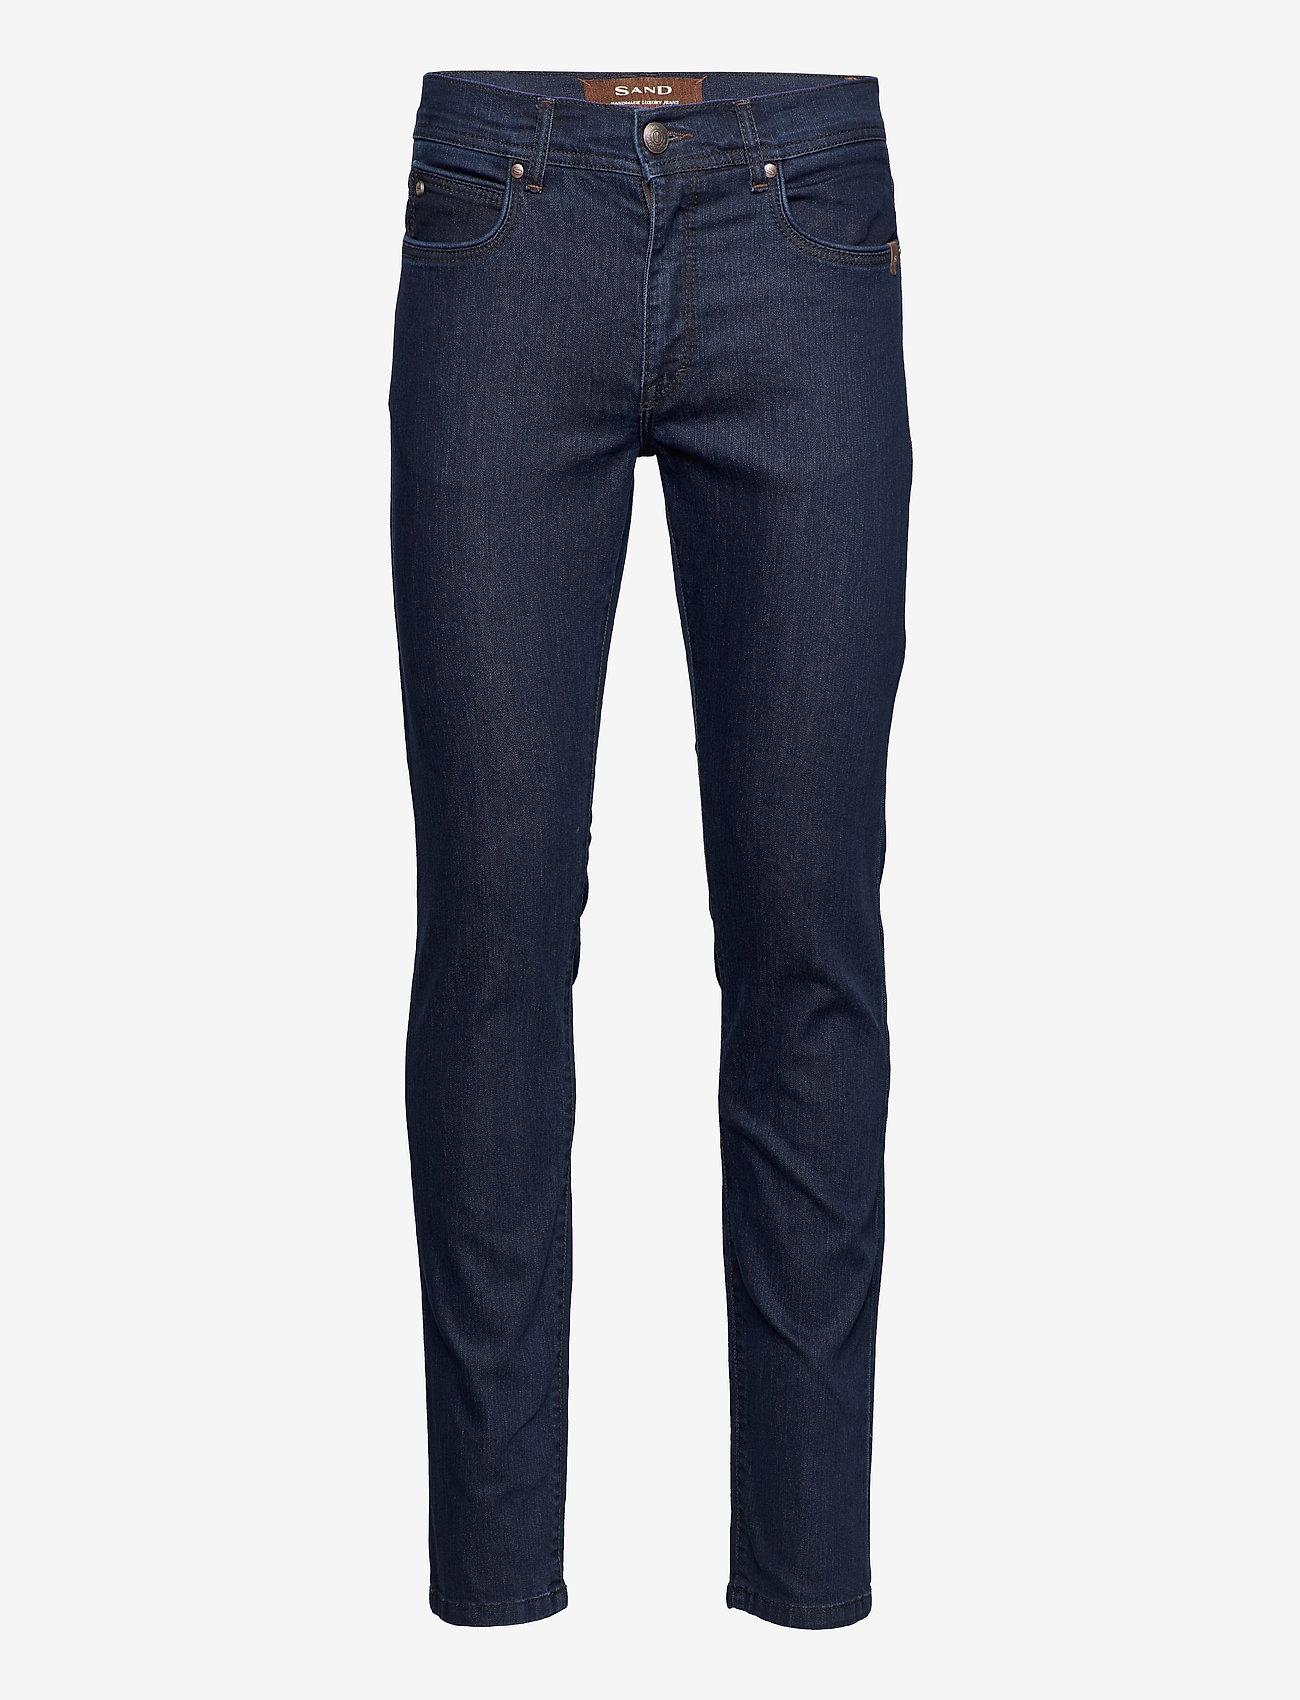 "SAND - S Stretch H - Burton NS 32"" - regular jeans - pattern - 0"